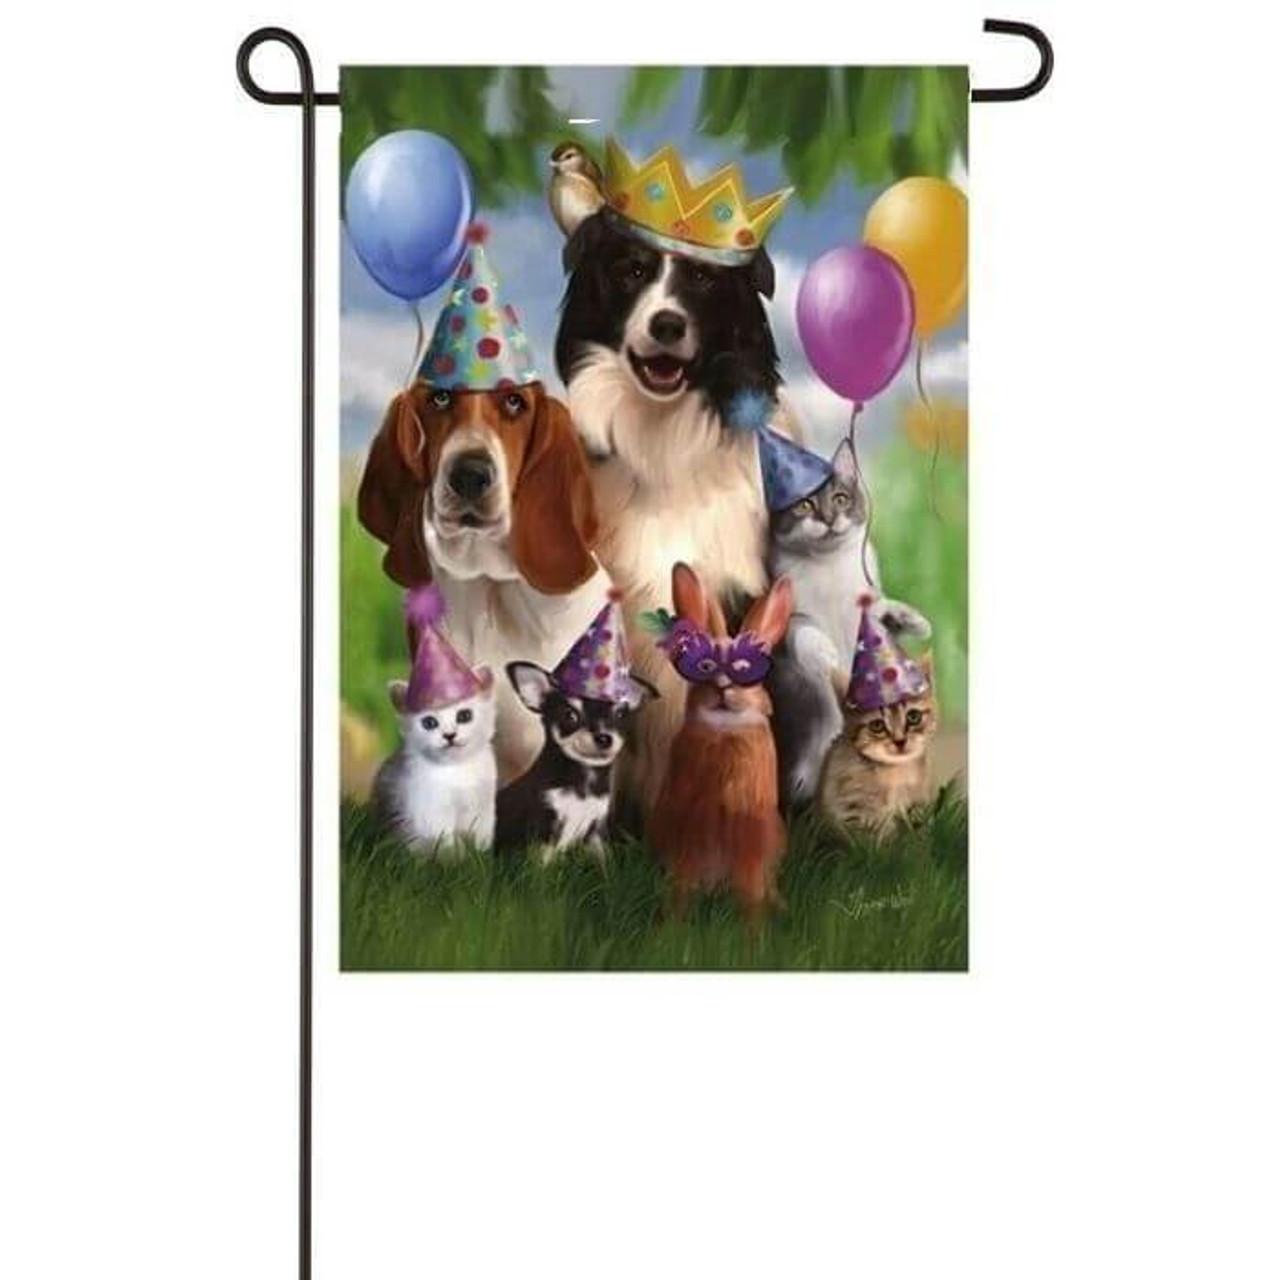 Party Animals Garden Flag